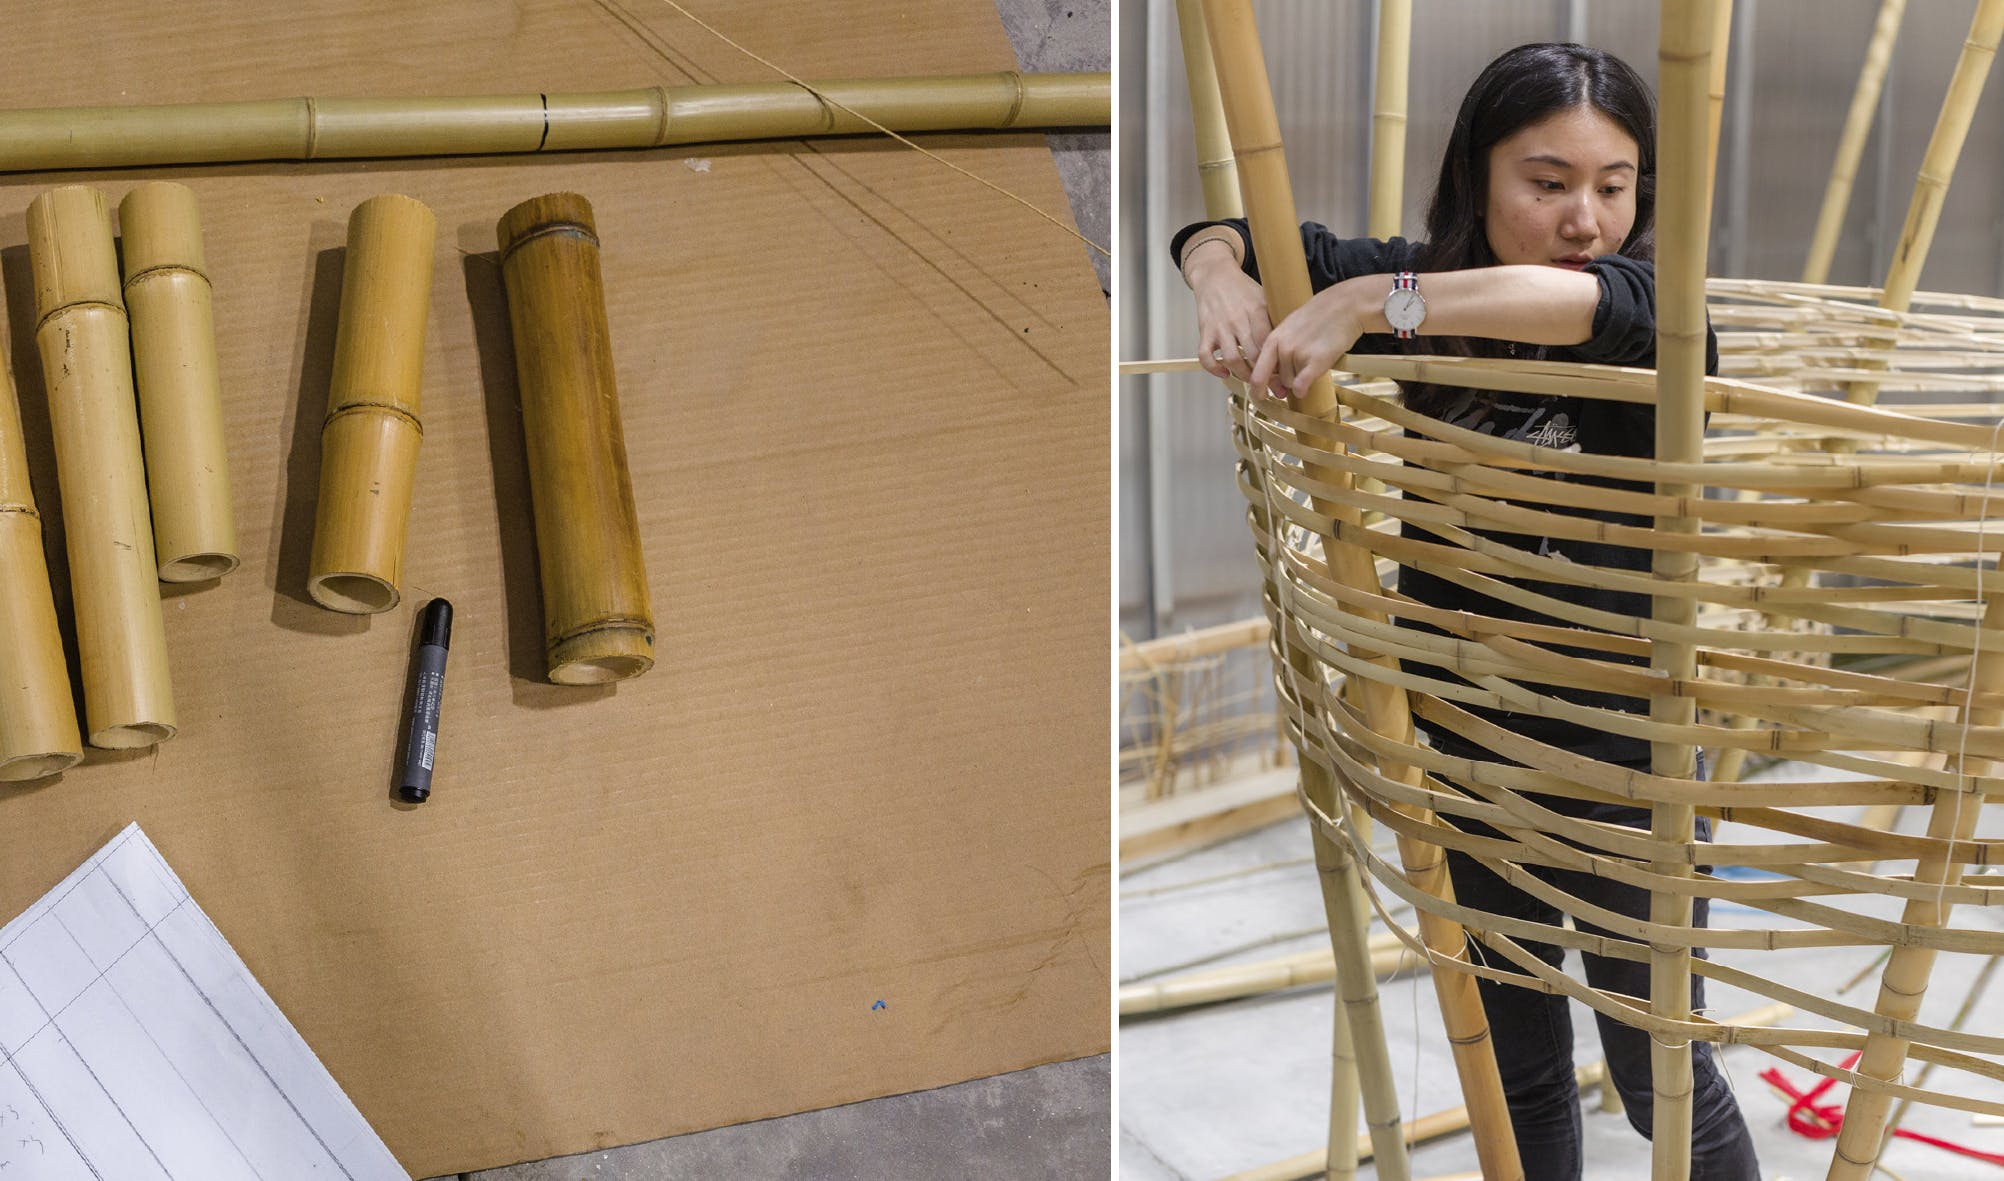 XJTLU Department of Architecture, Bamboo Workshop, 2016.